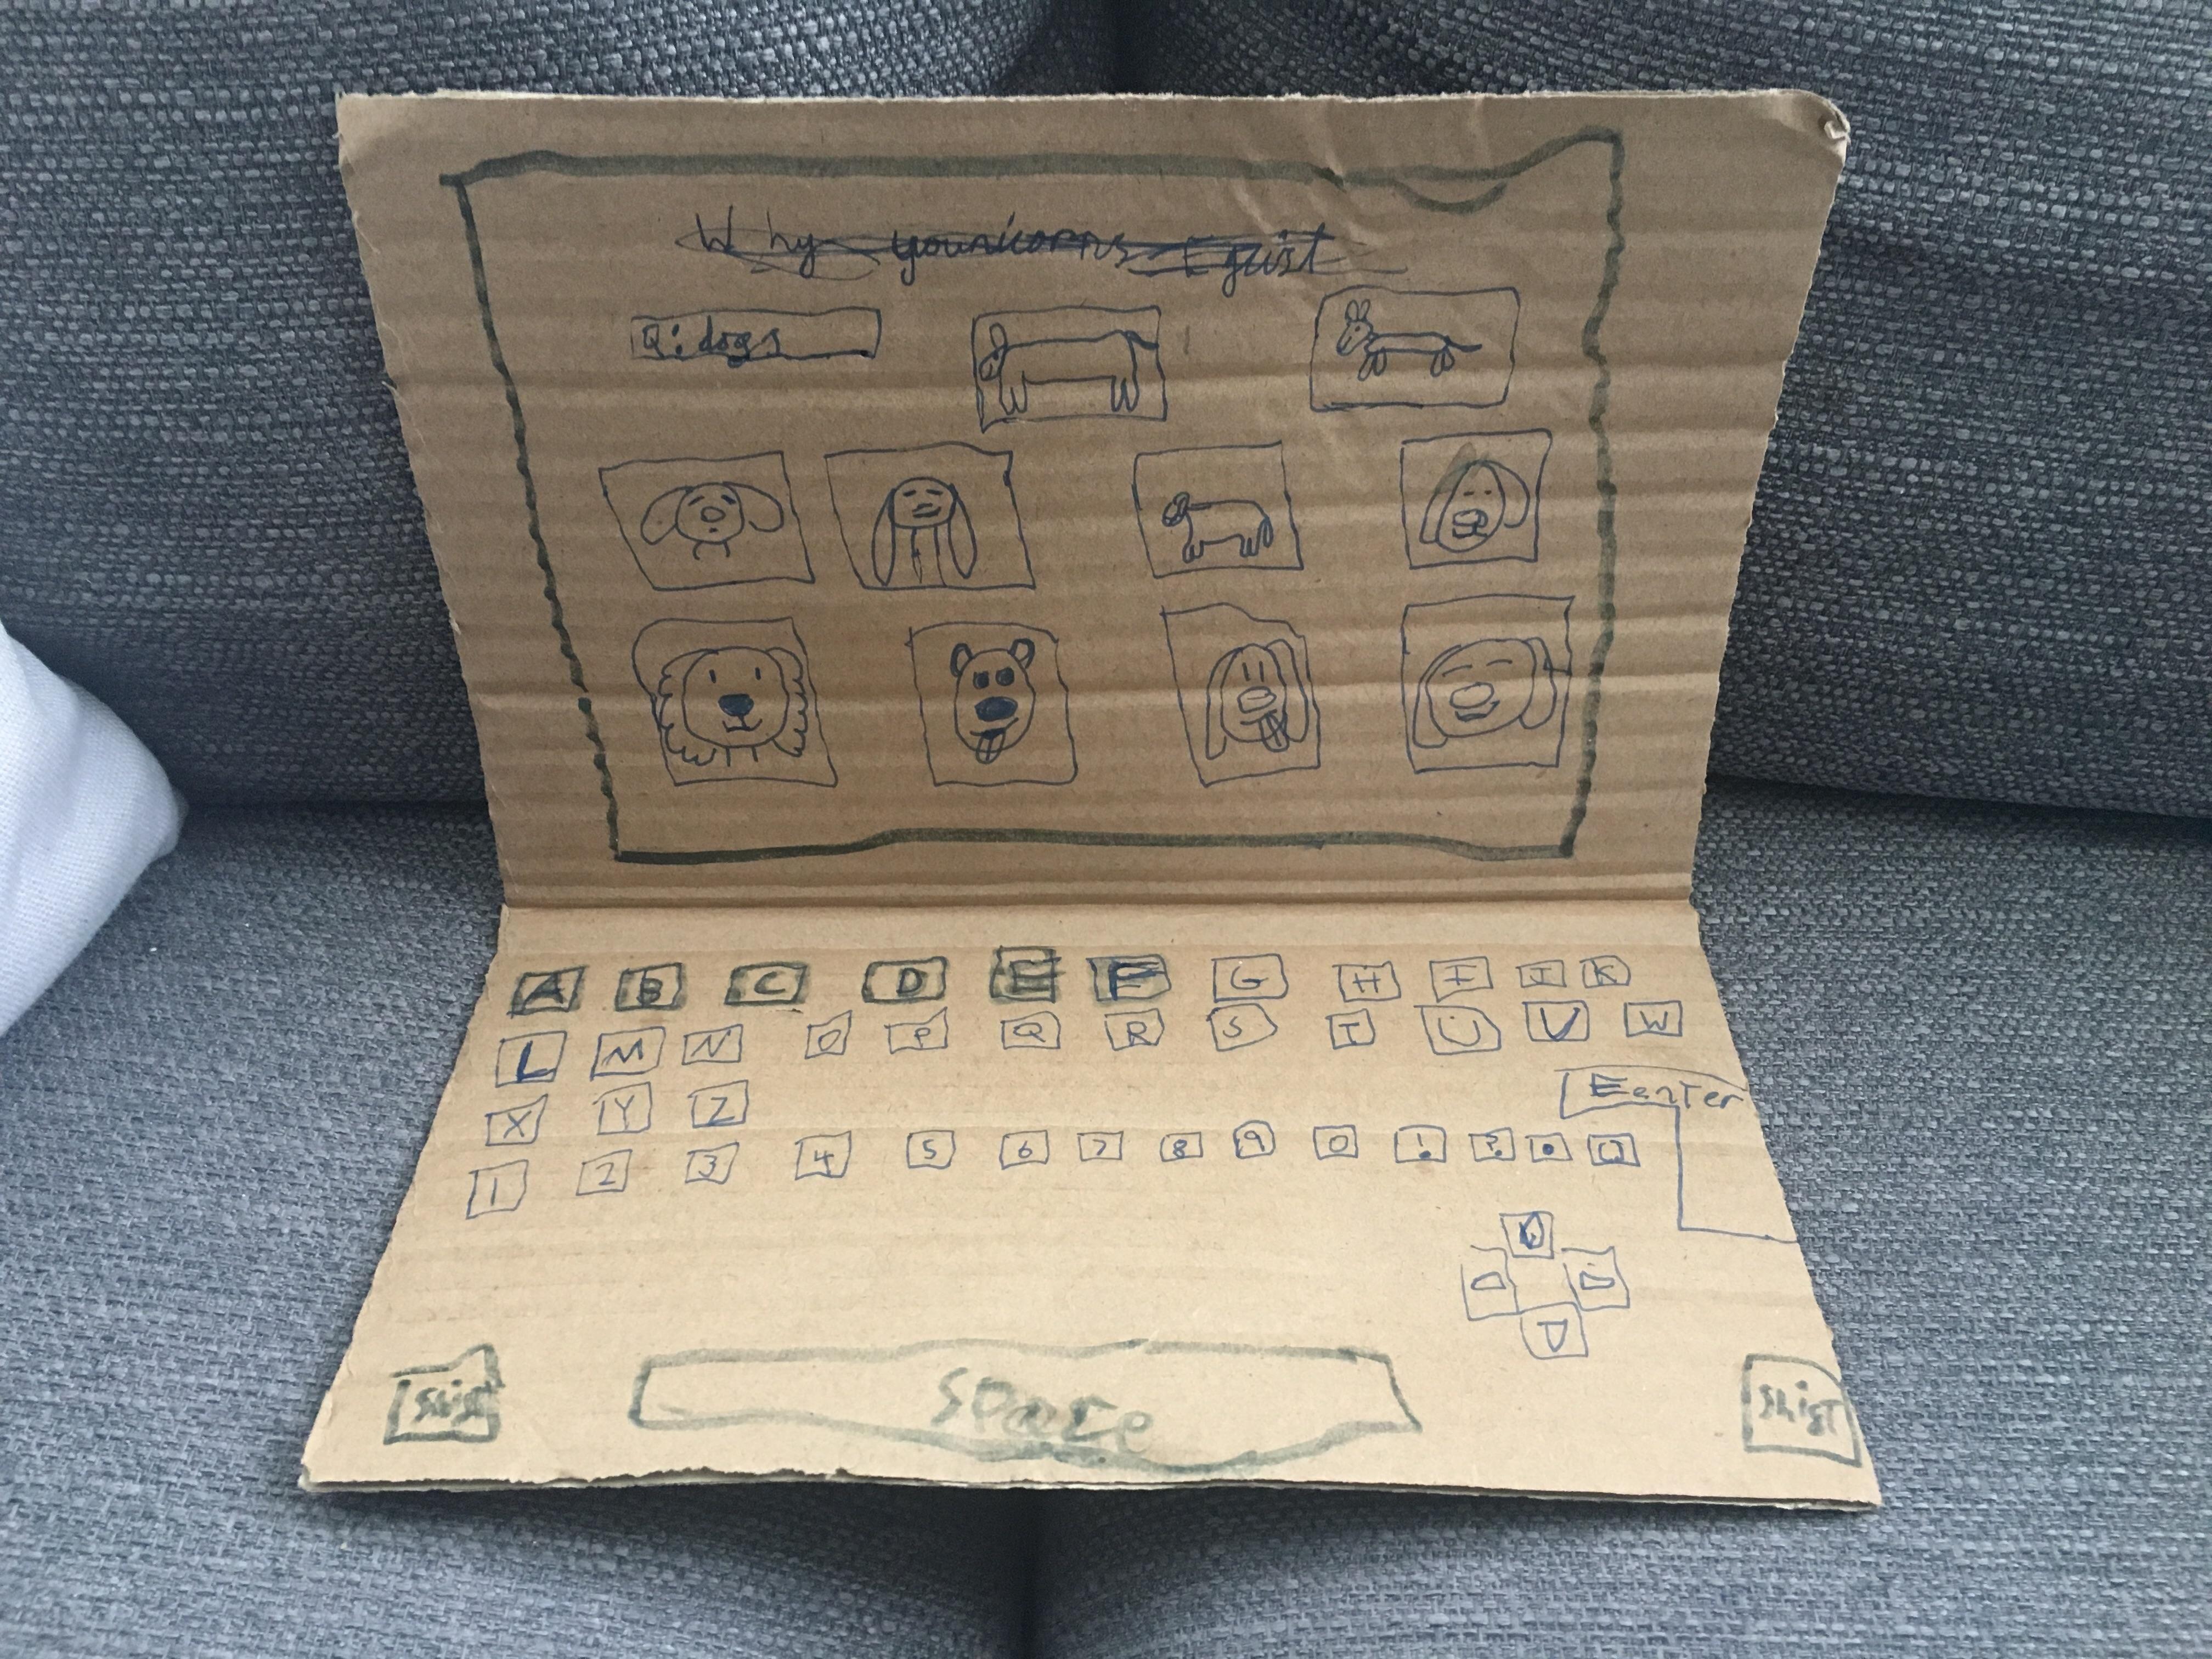 Una nena creó su propia computadora